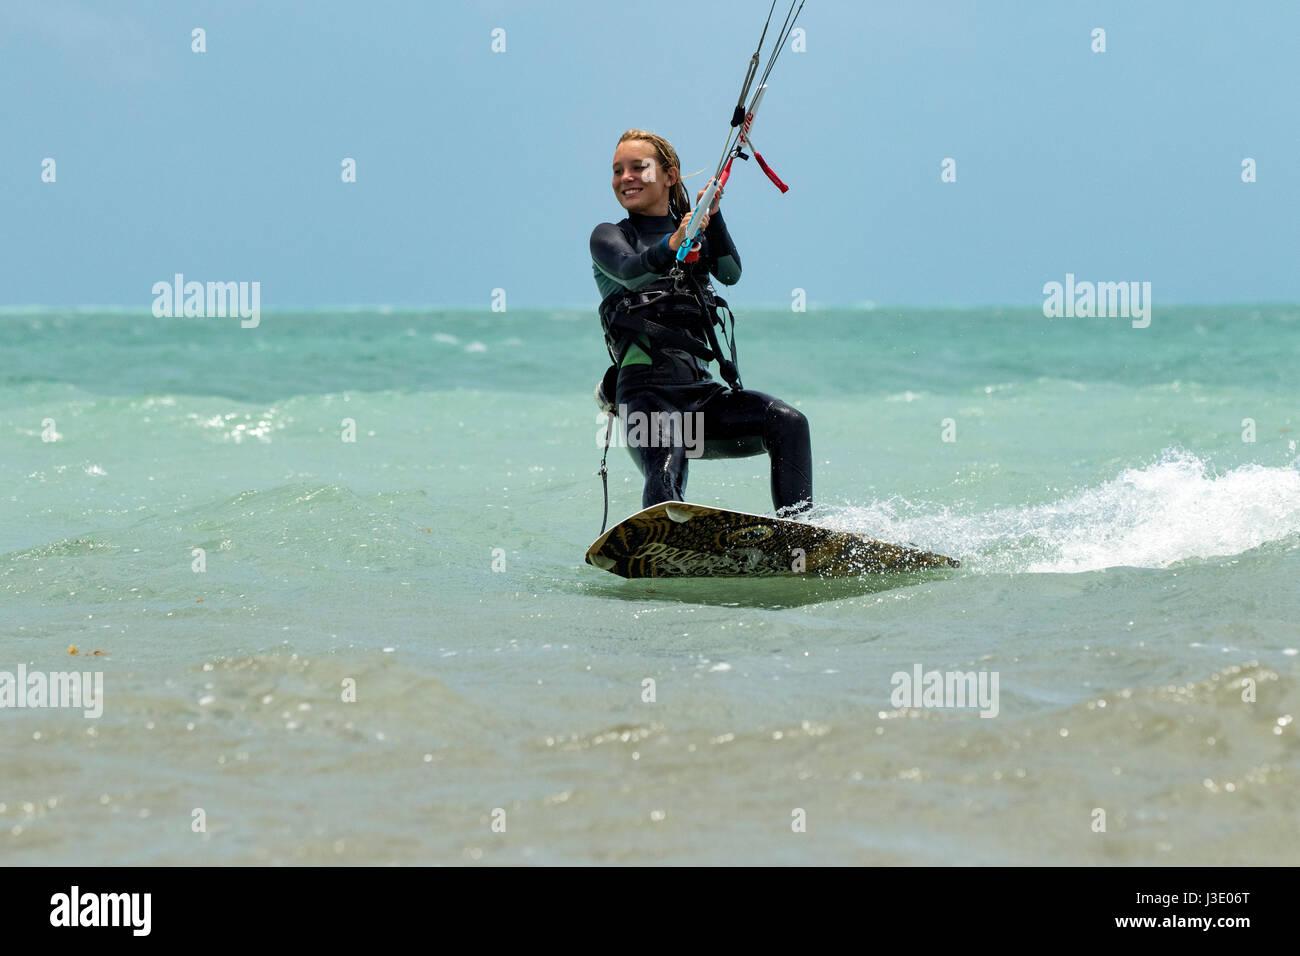 Young girl kitesurfing at Coco Plum Beach, Marathon Key, Florida, USA - Stock Image